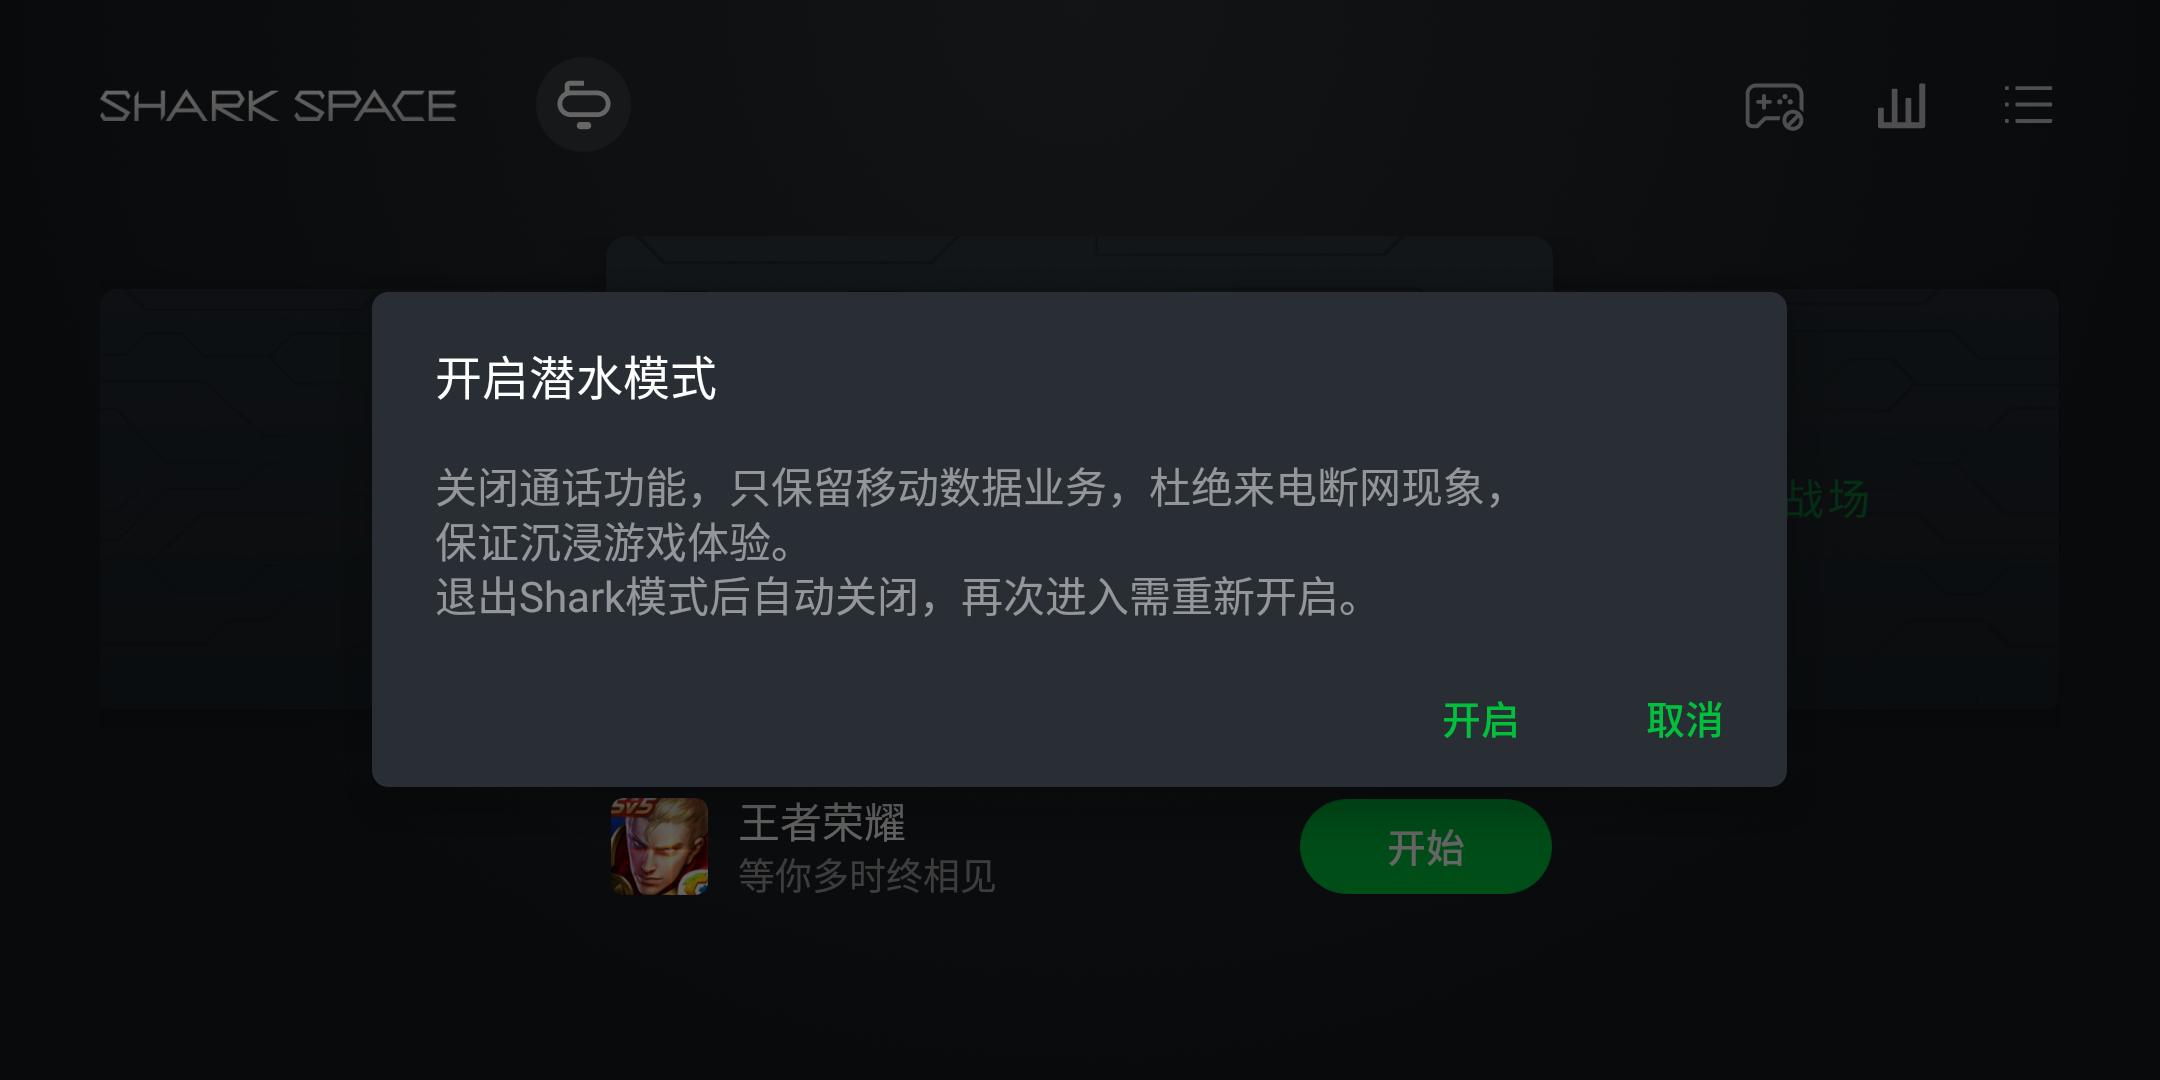 Screenshot_2018-04-27-12-23-32-538_com.blackshark.png